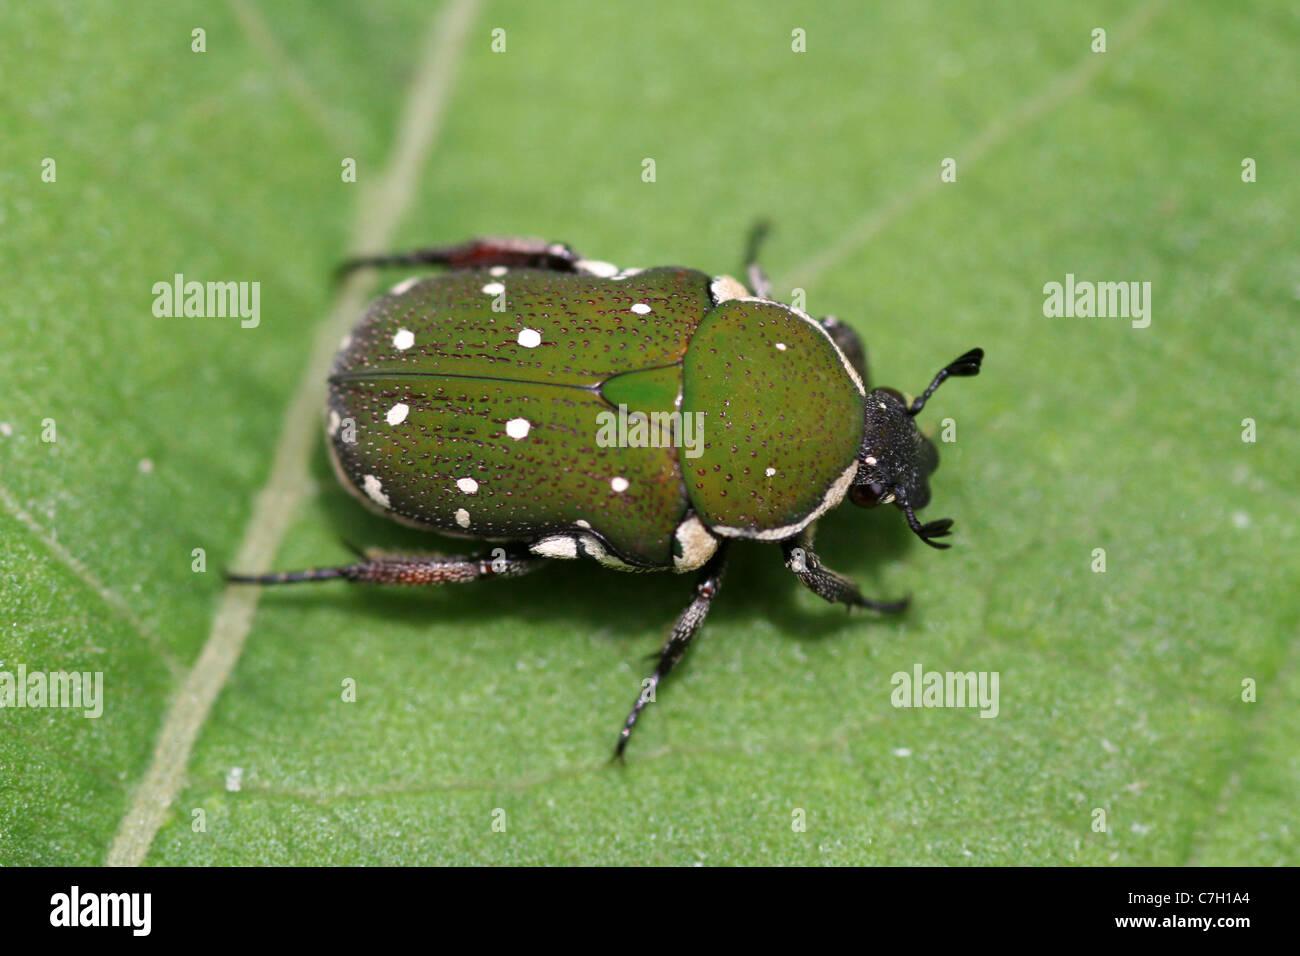 Green Chafer Beetle Glycyphana sp. Lake Toba, Sumatra - Stock Image